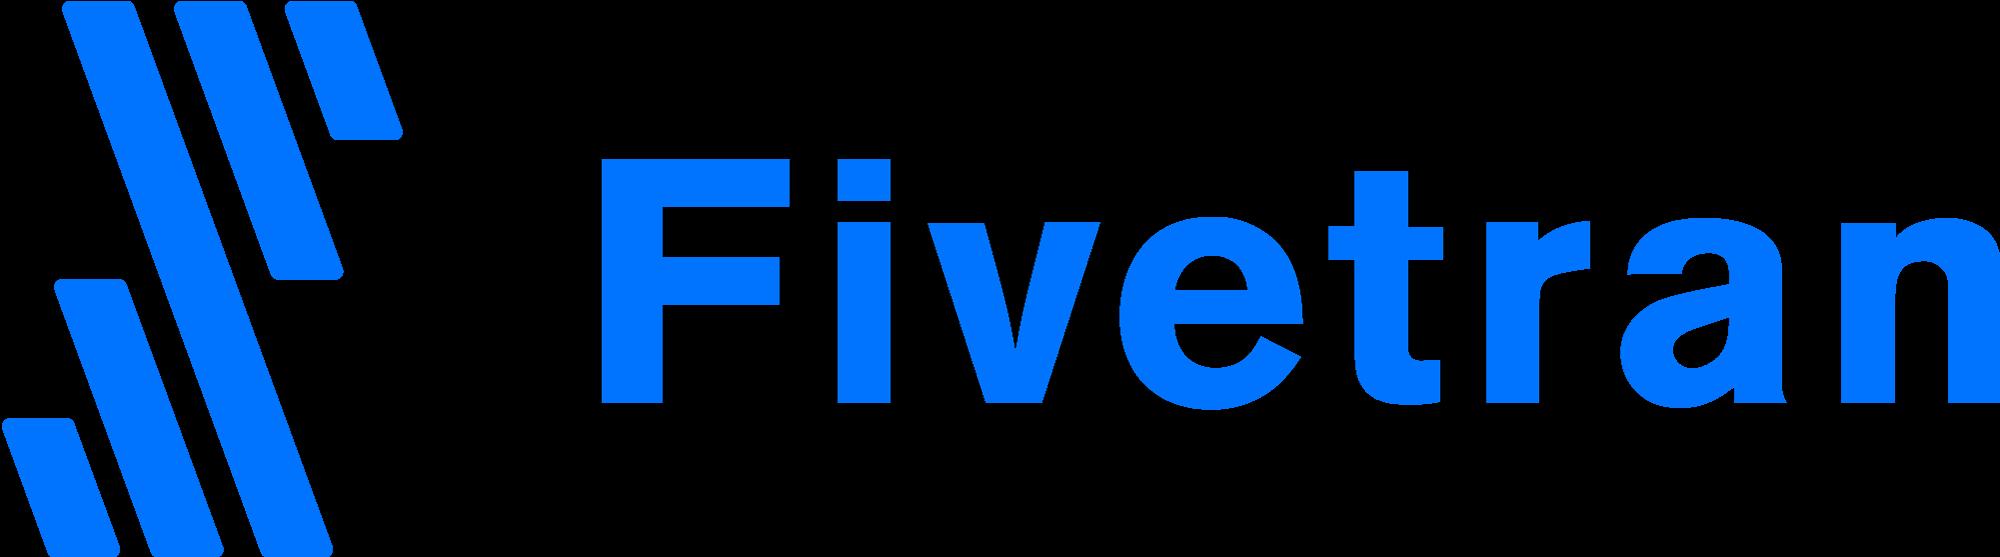 fivetran - sponsor DATA festival